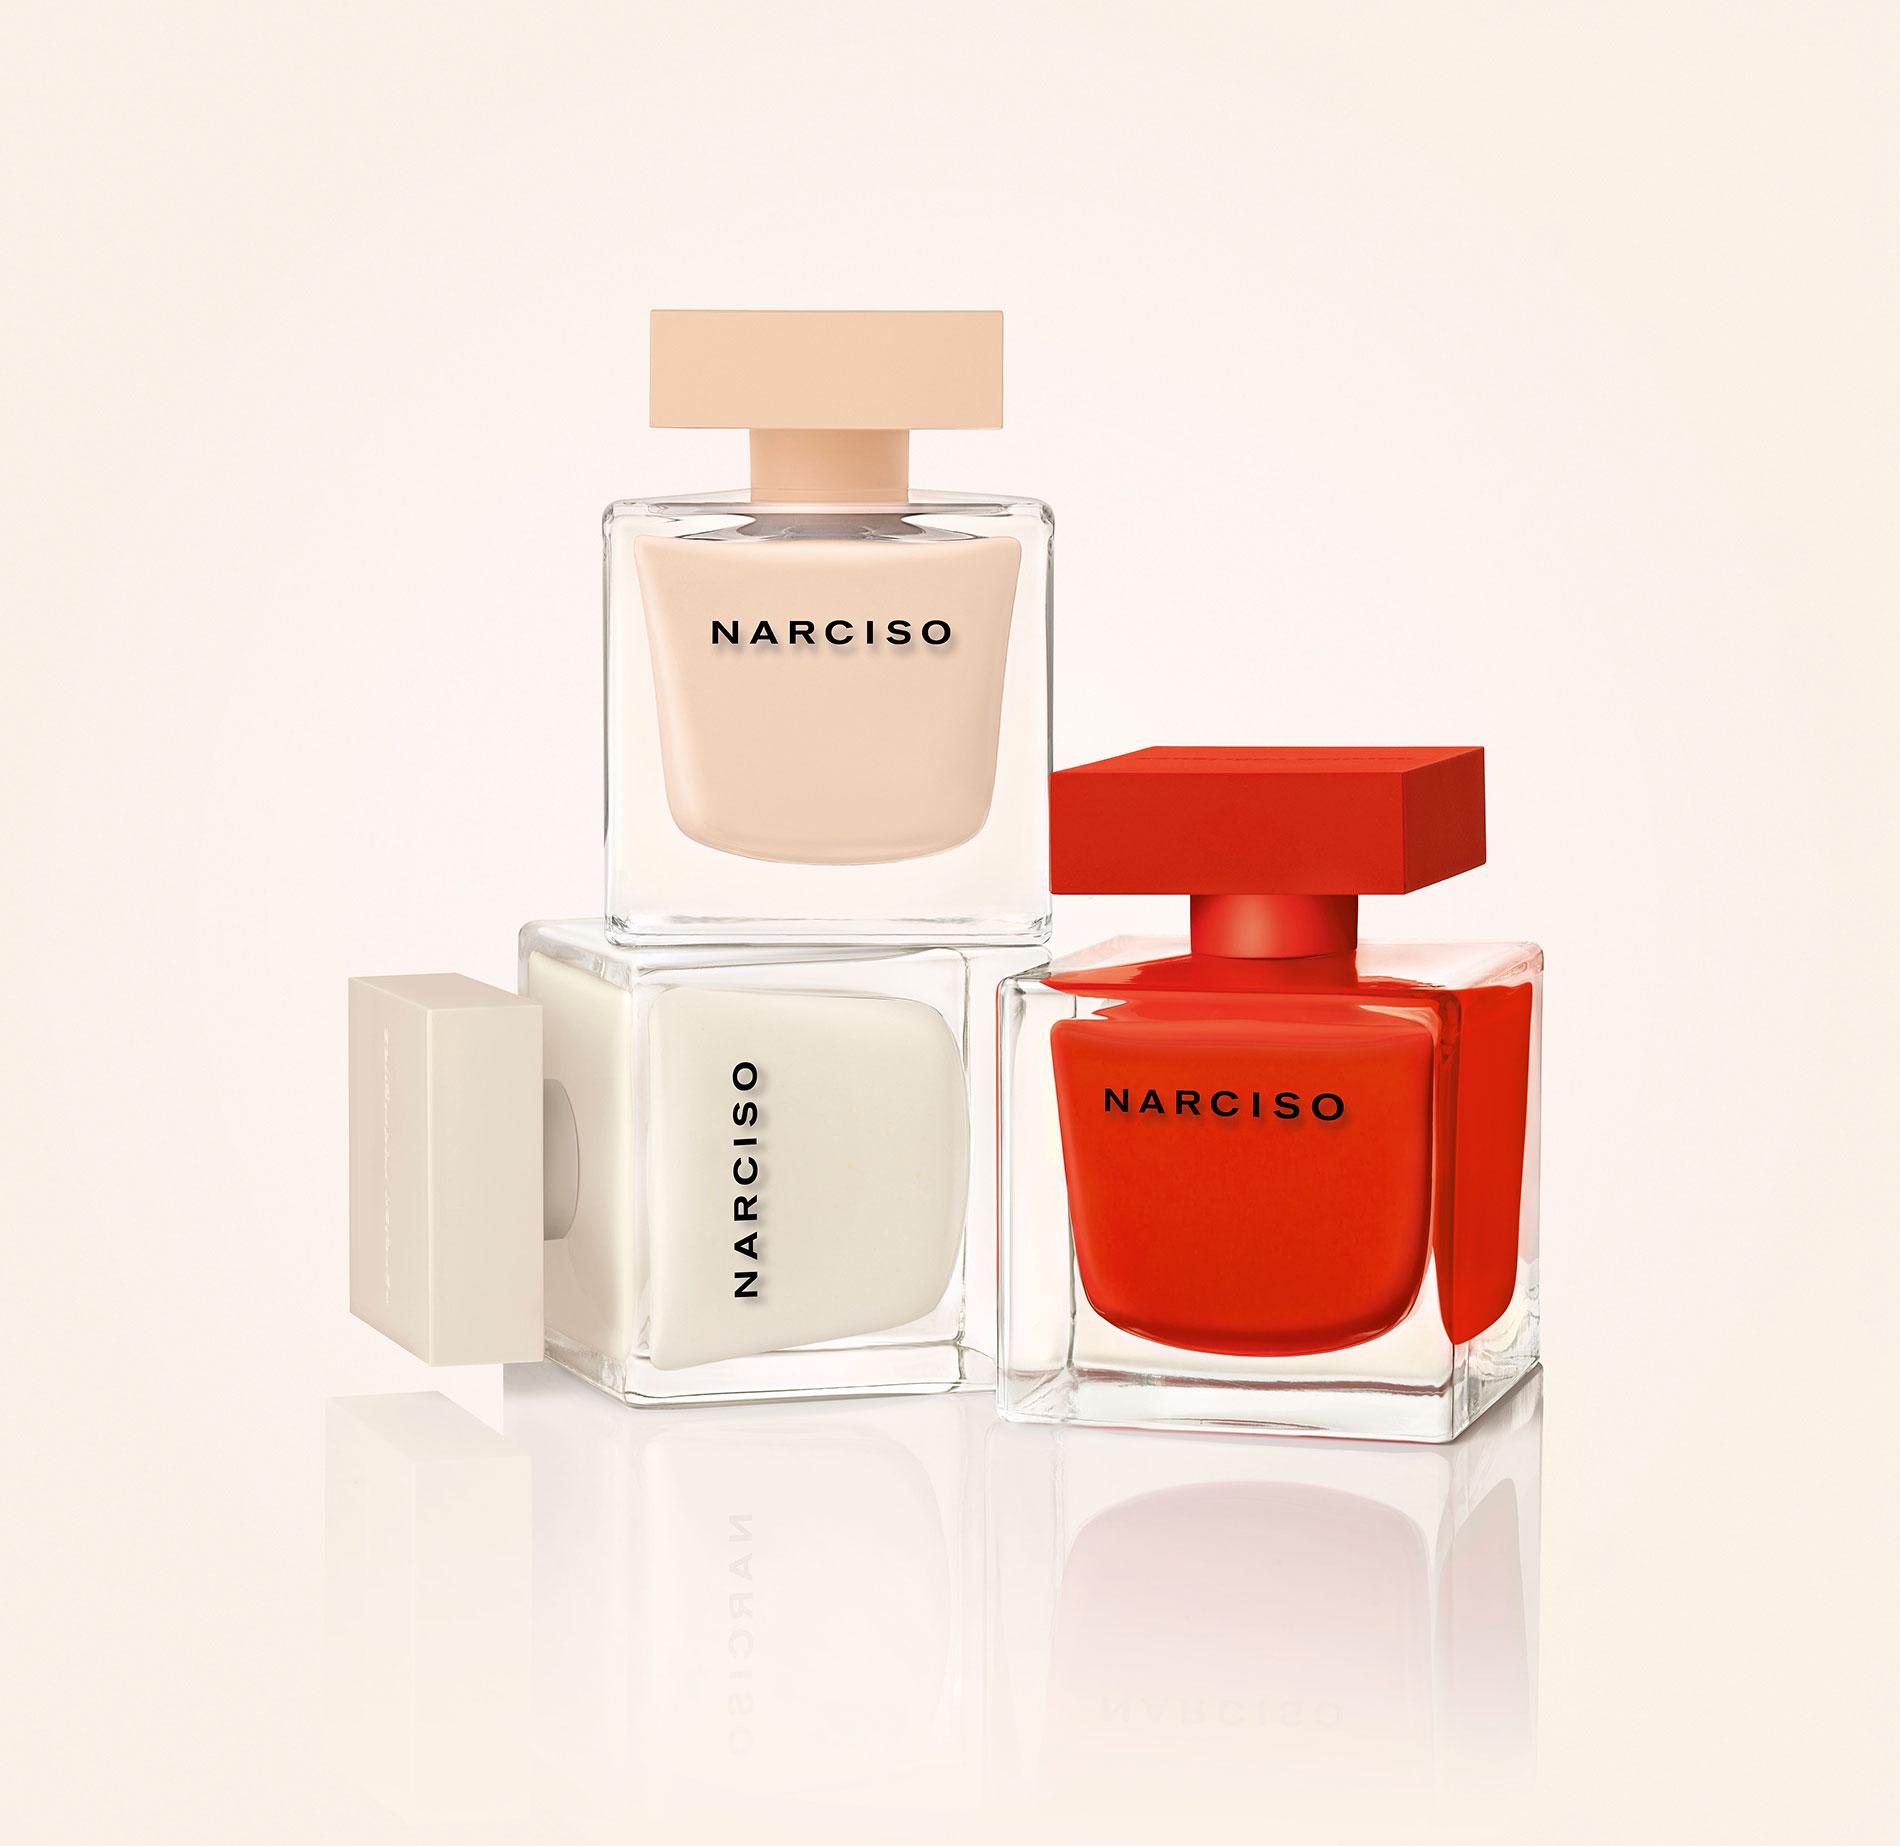 ed930007d9d Narciso Rouge Narciso Rodriguez perfume - una nuevo fragancia para ...